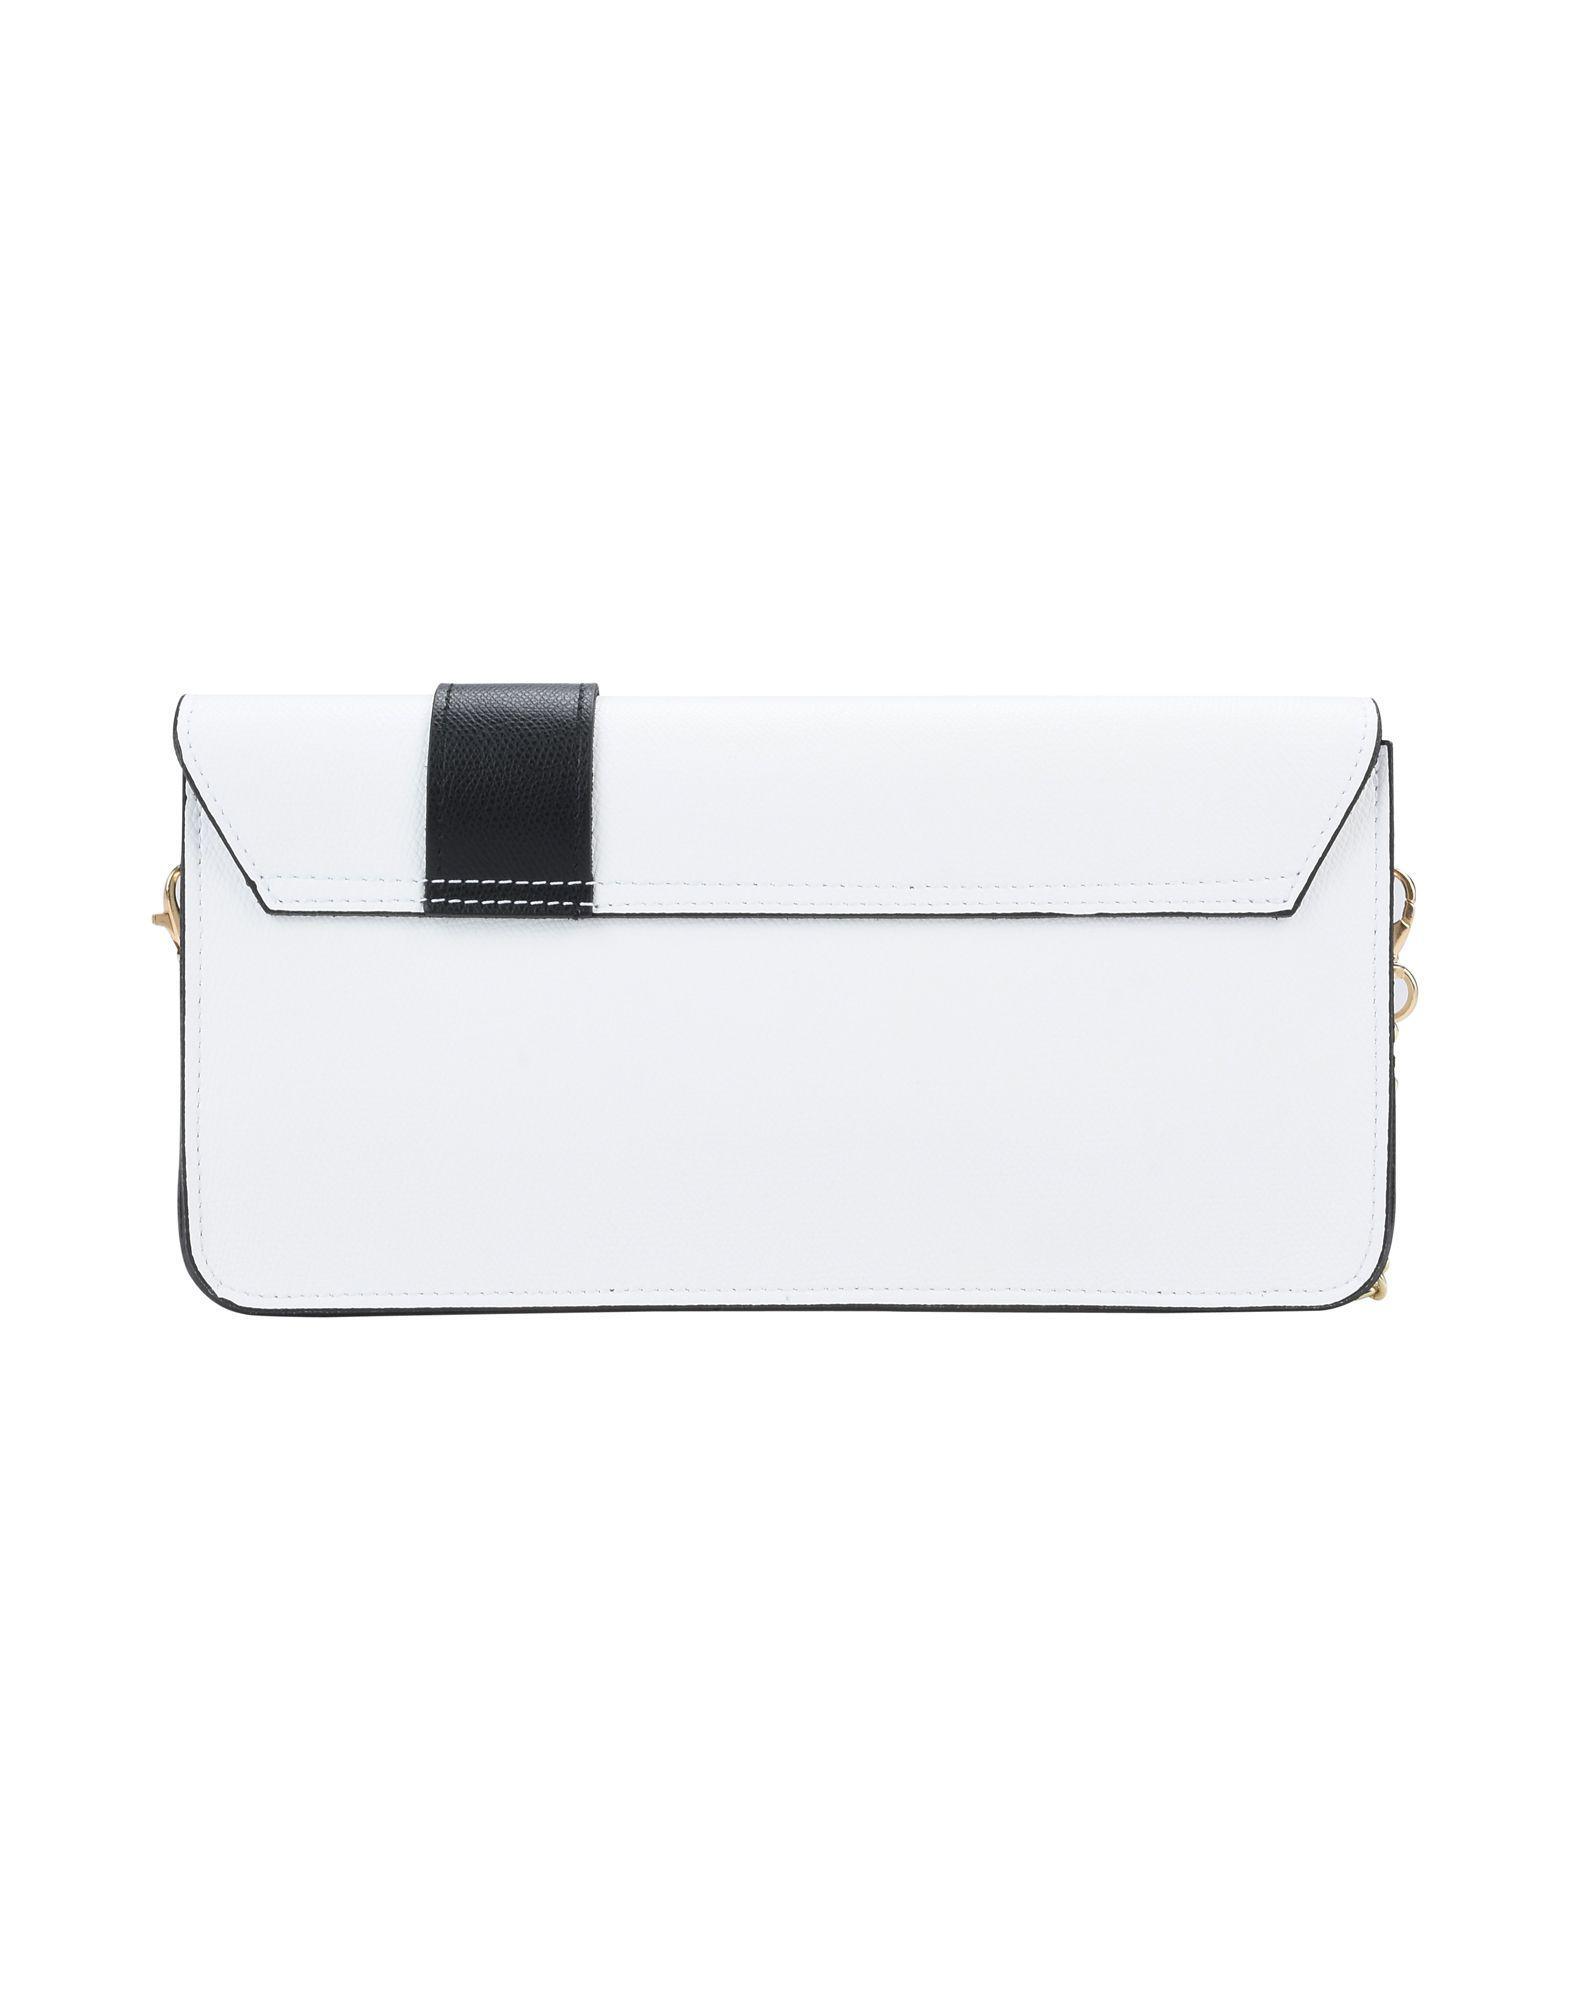 Parentesi Leather Cross-body Bag in White